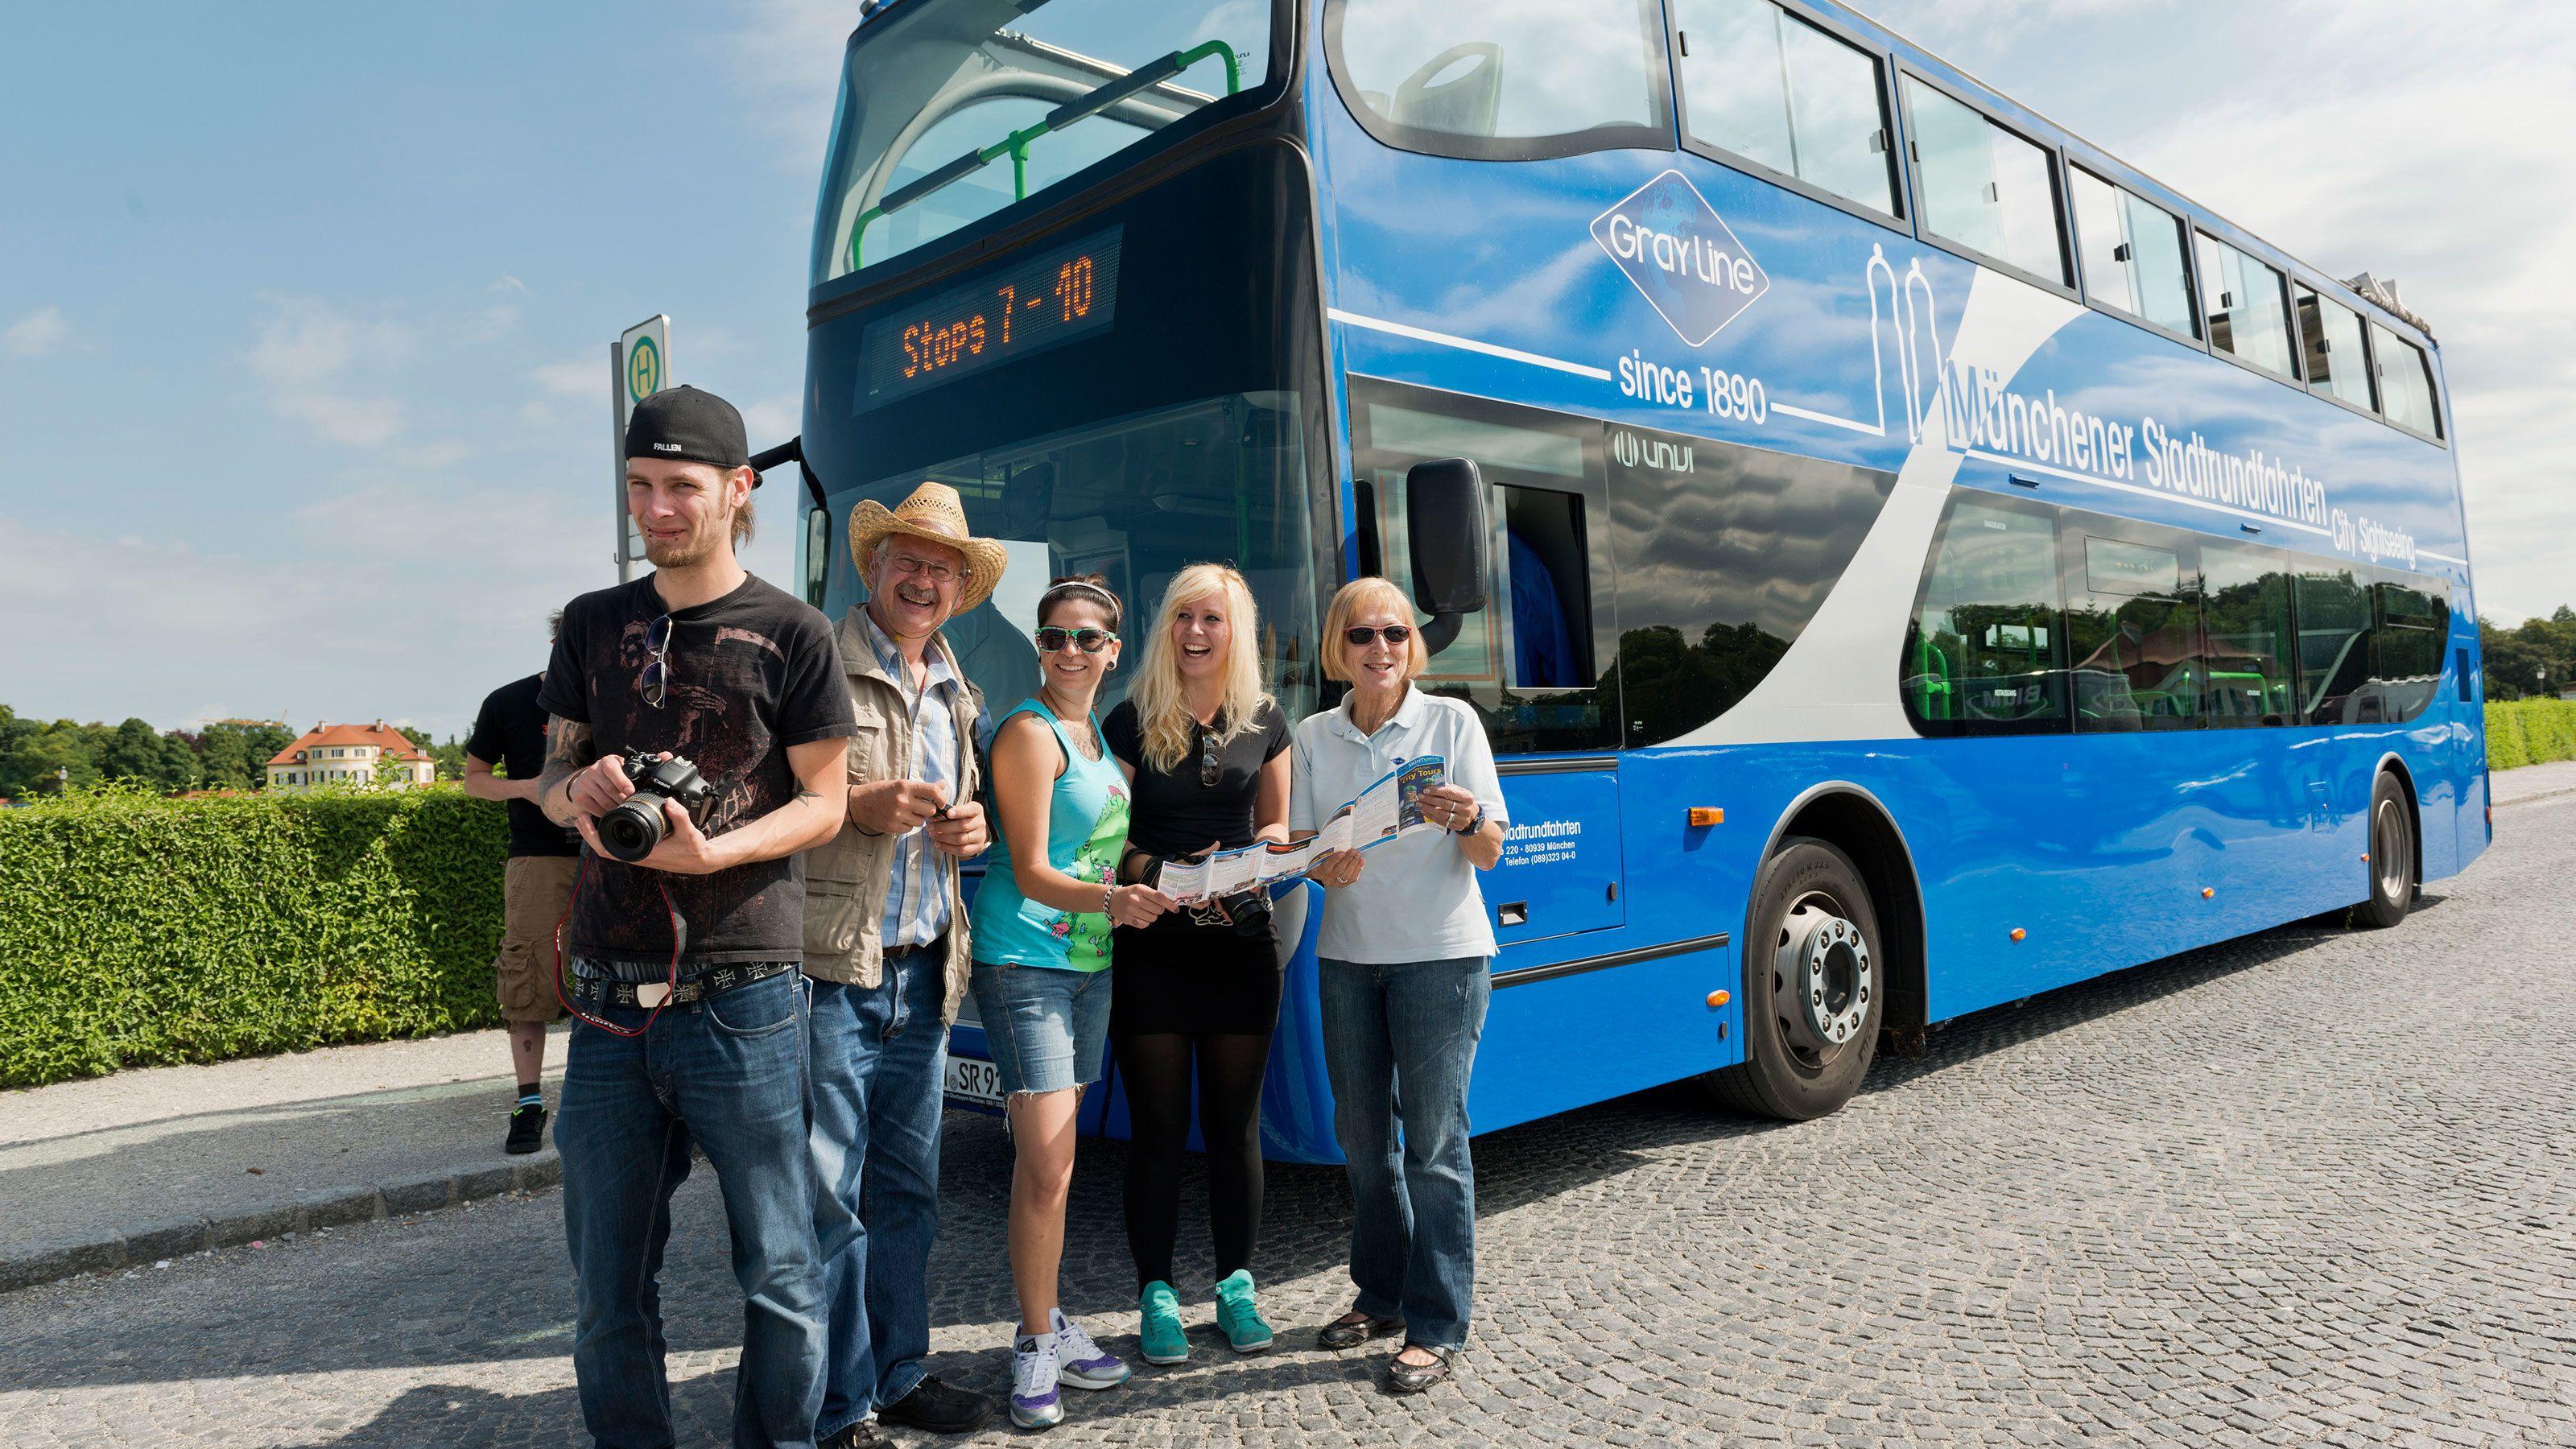 Yhdistelmäkierros: hop-on hop-off -kiertoajelu bussilla ja kierros müncheni...